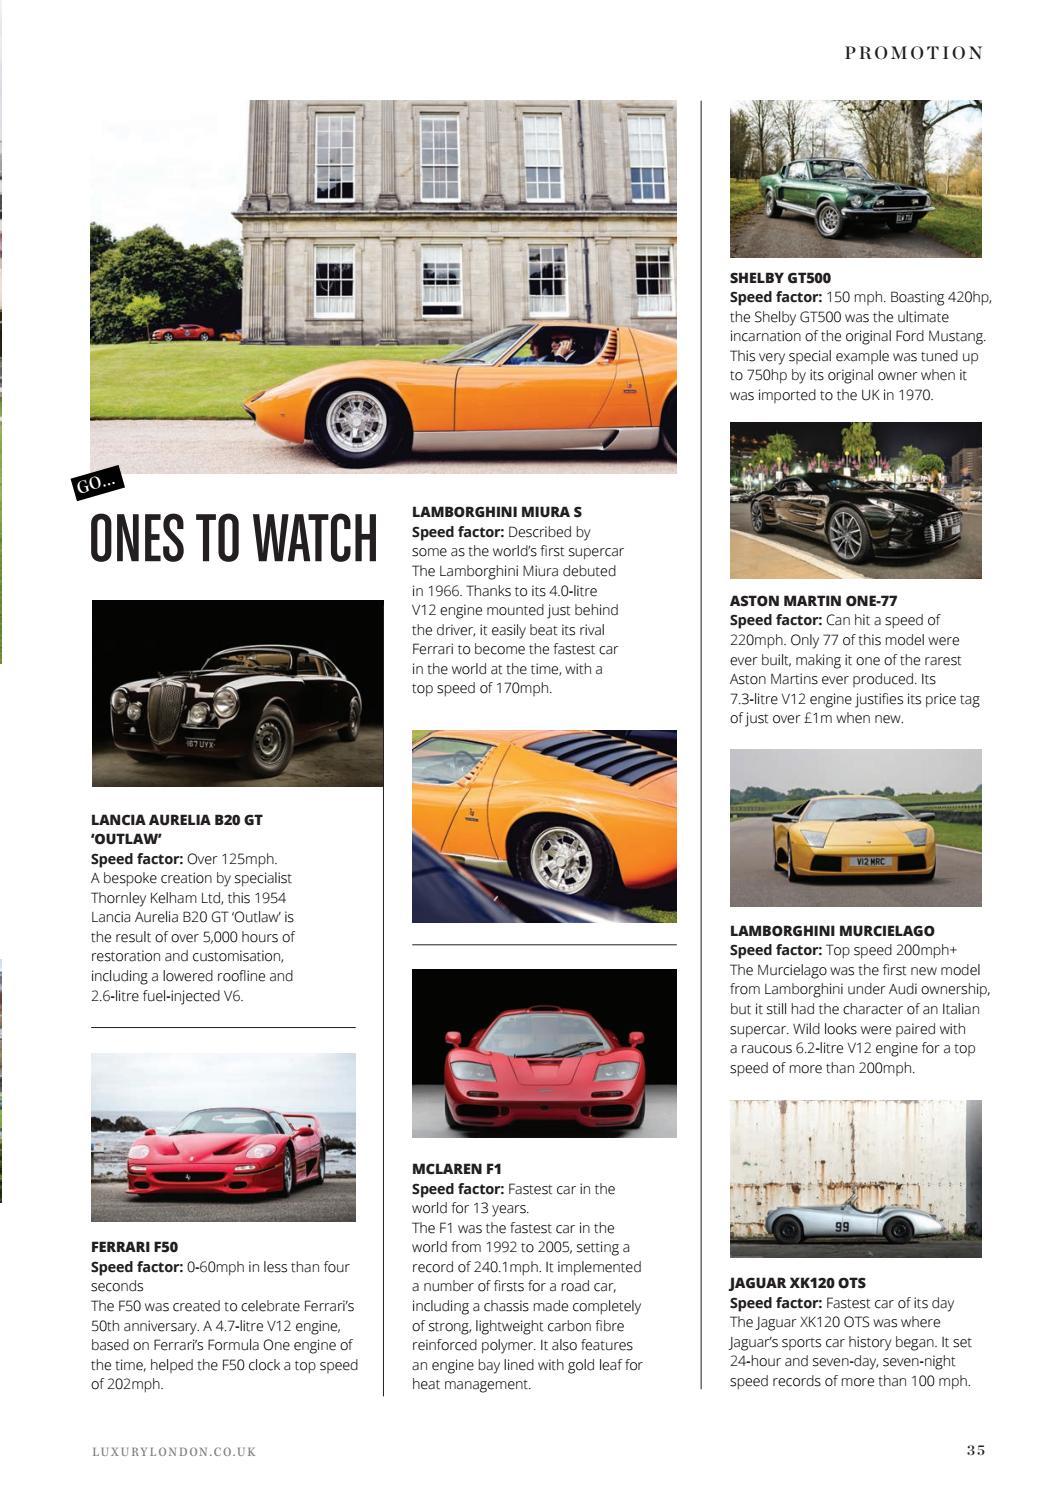 Canary Wharf Magazine May 2018 by Luxury London Media - issuu